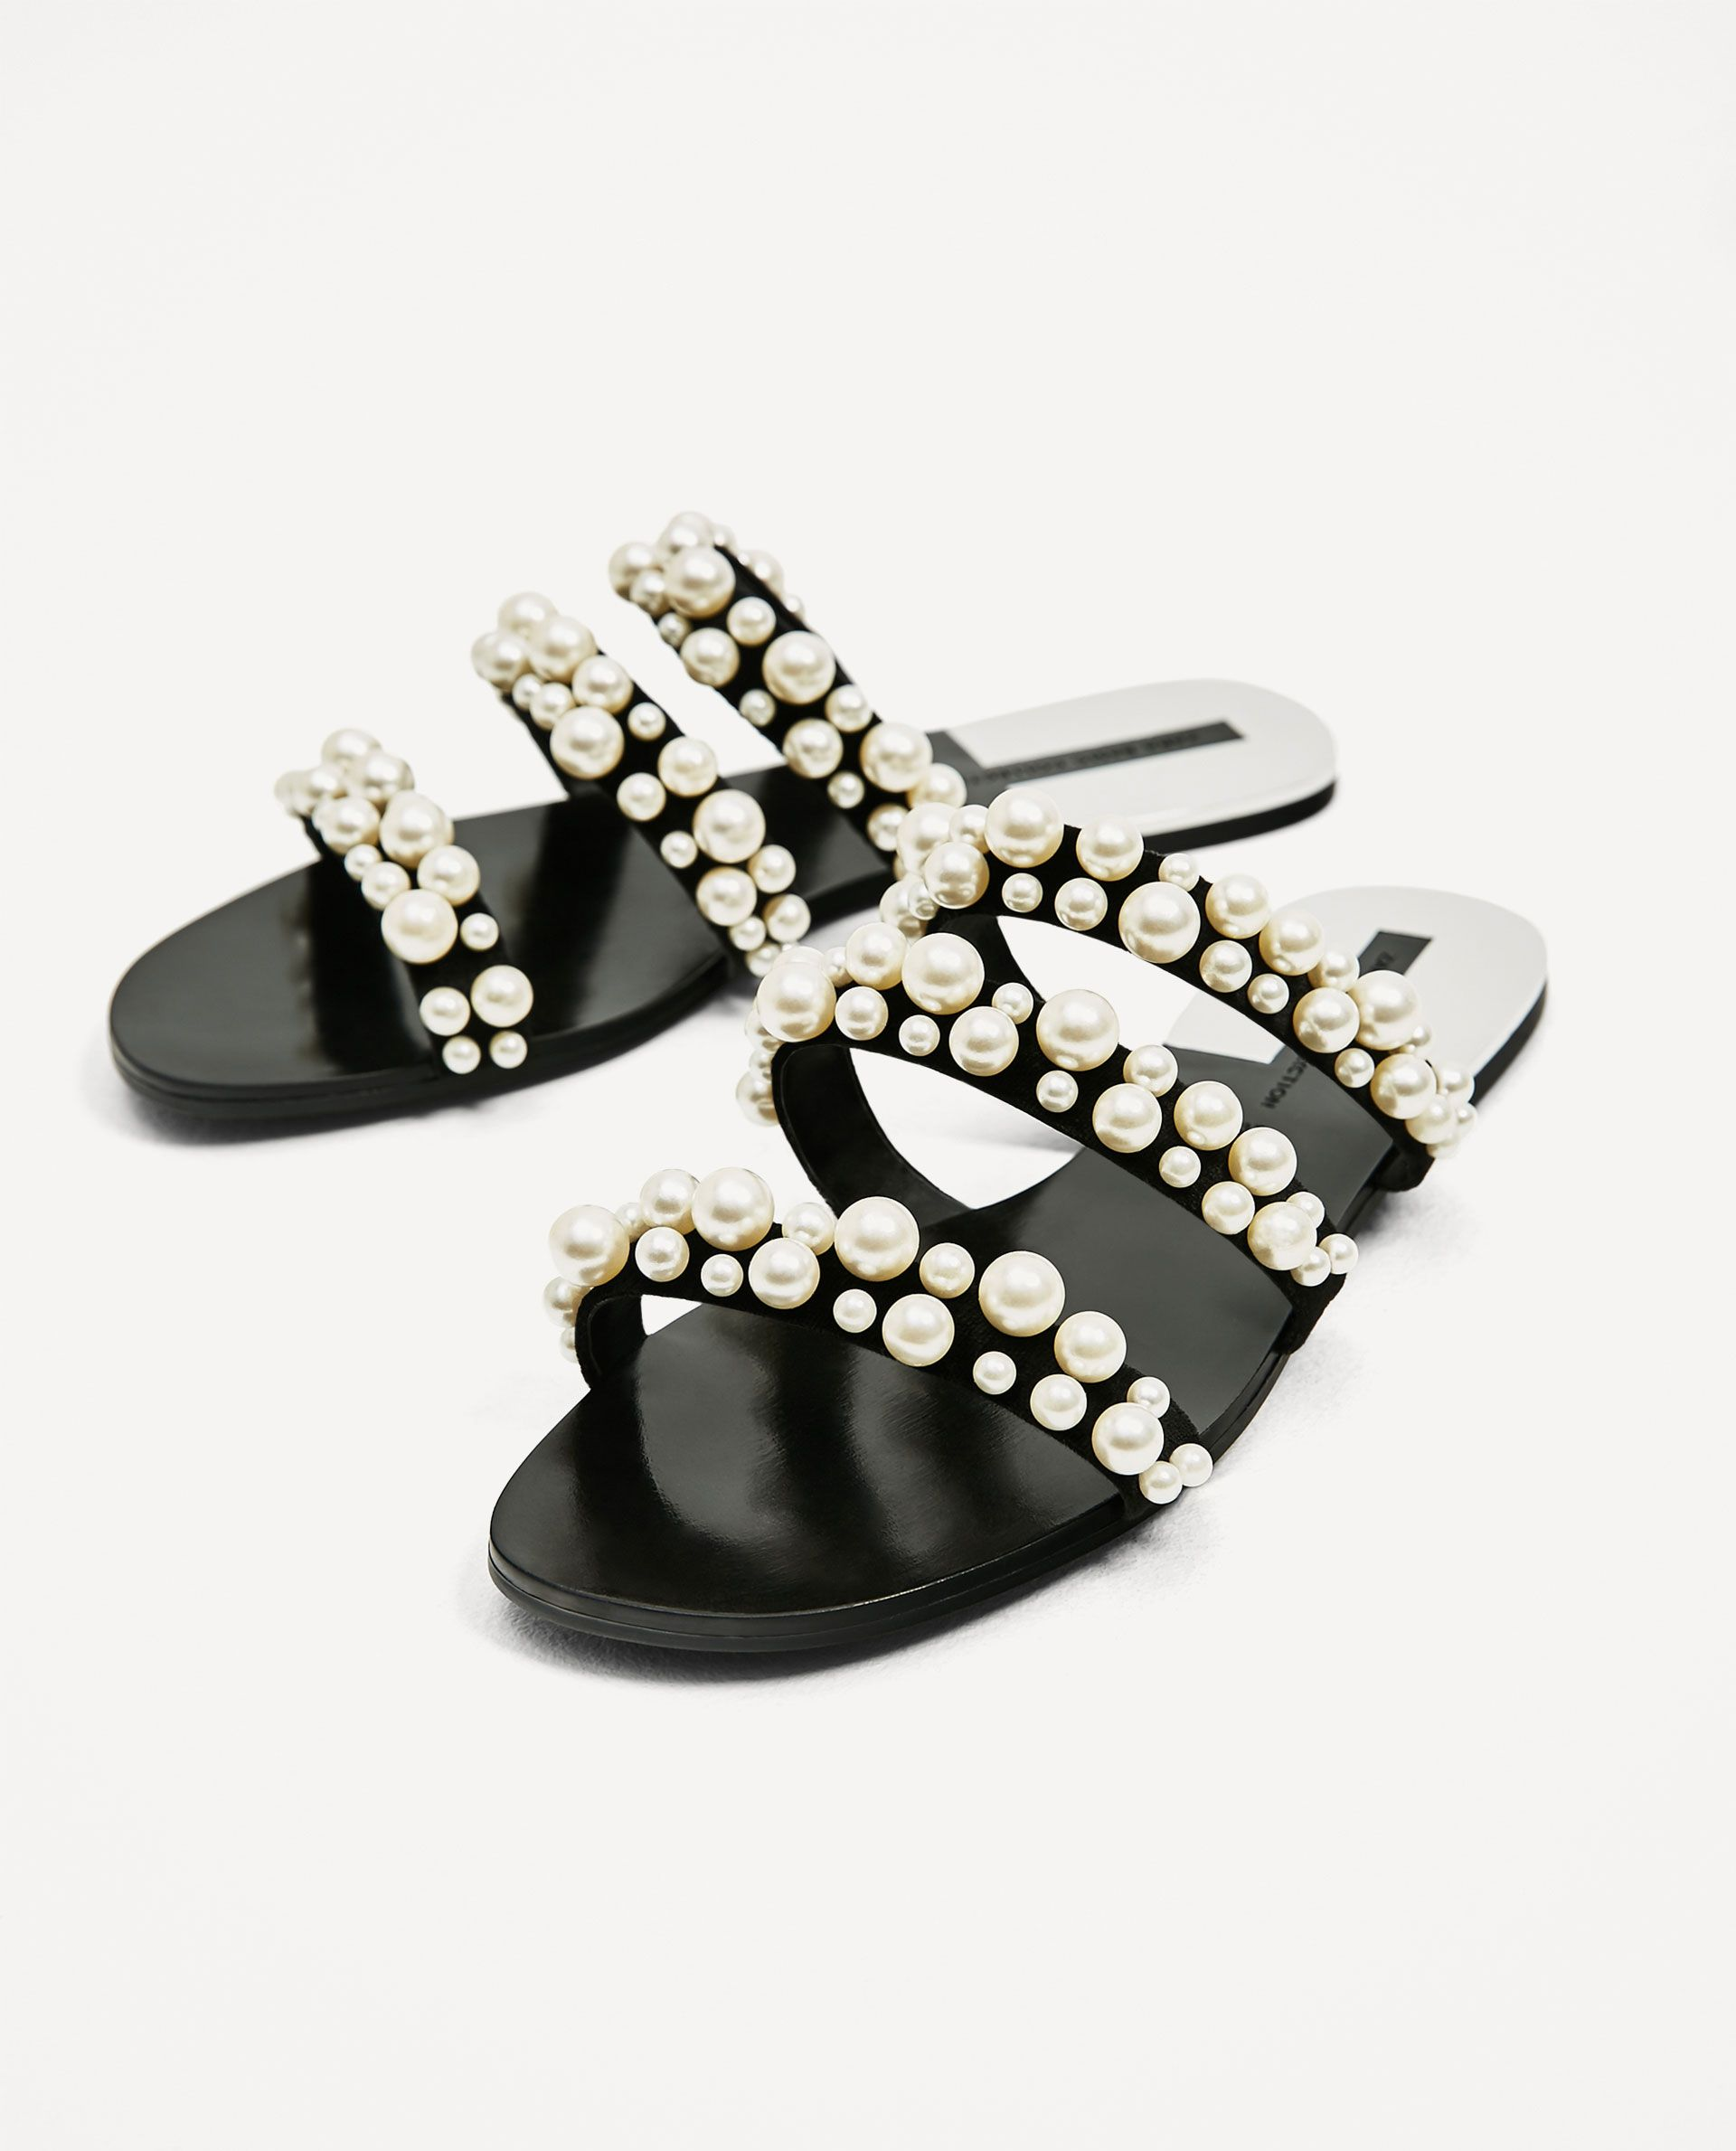 Zara The Shoes Uk In Best YIf6gmvb7y